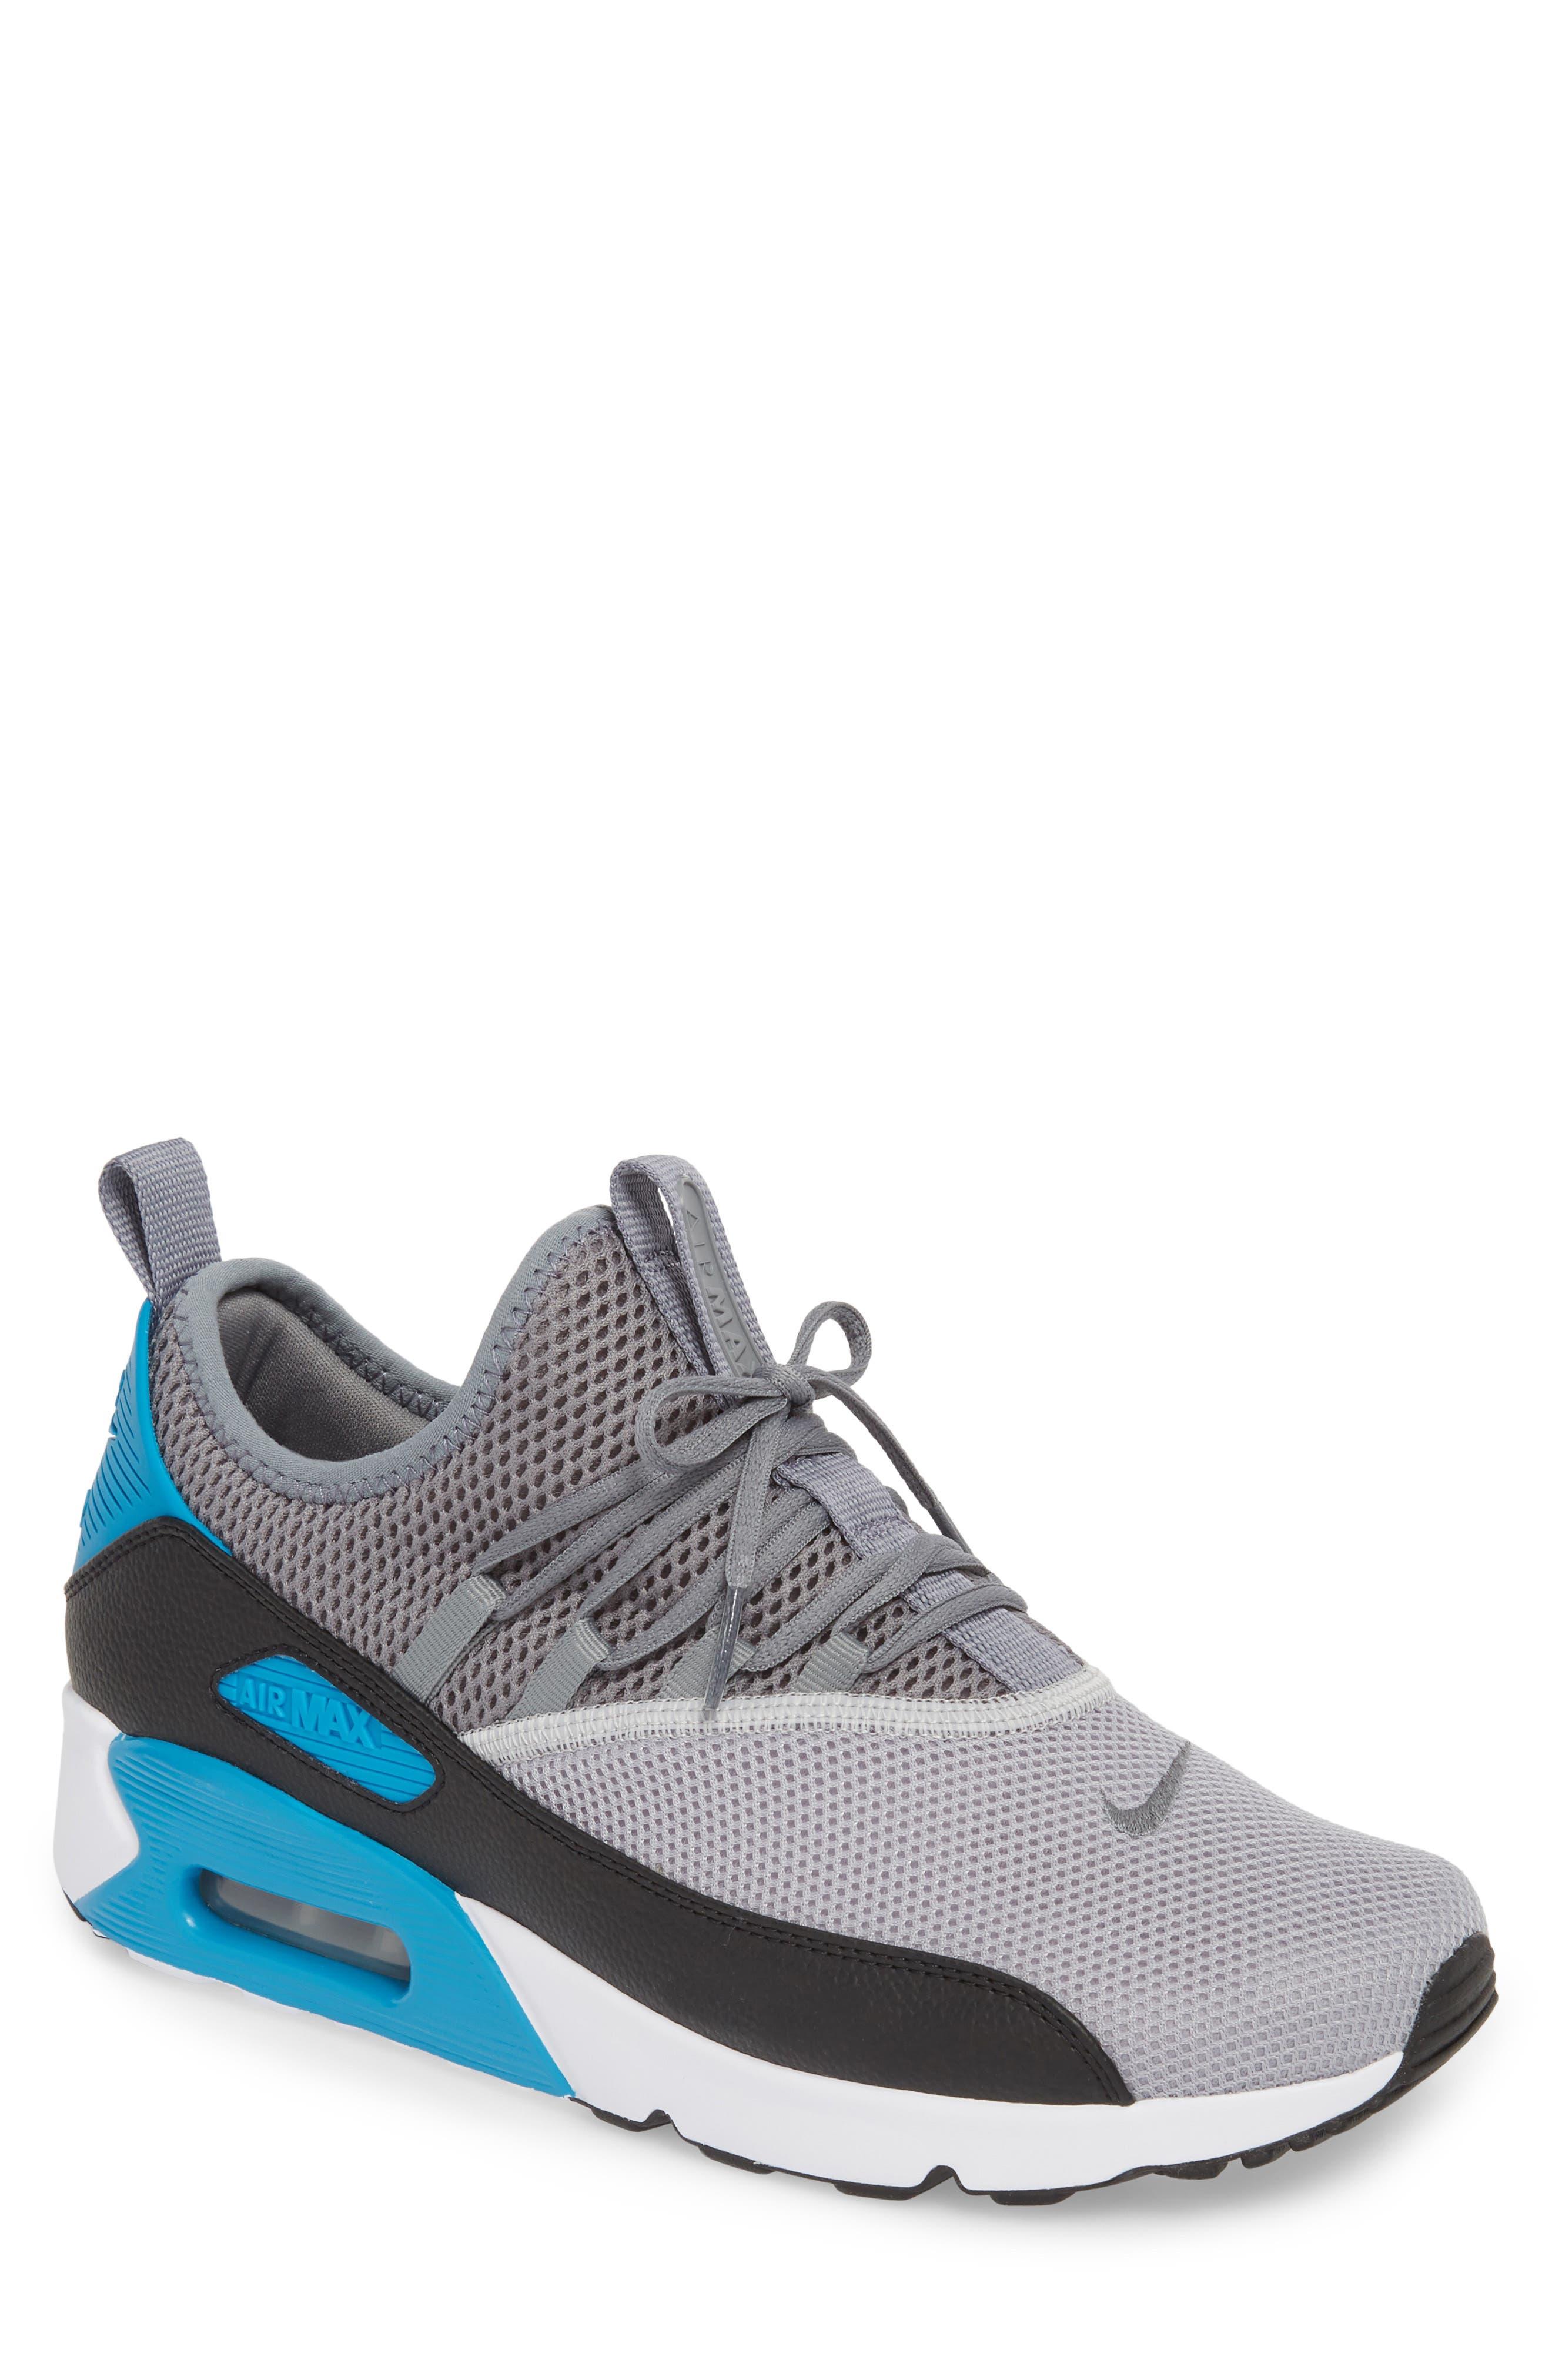 Nike Air Max 90 D'eau Blanche acheter pas cher k904ekwl